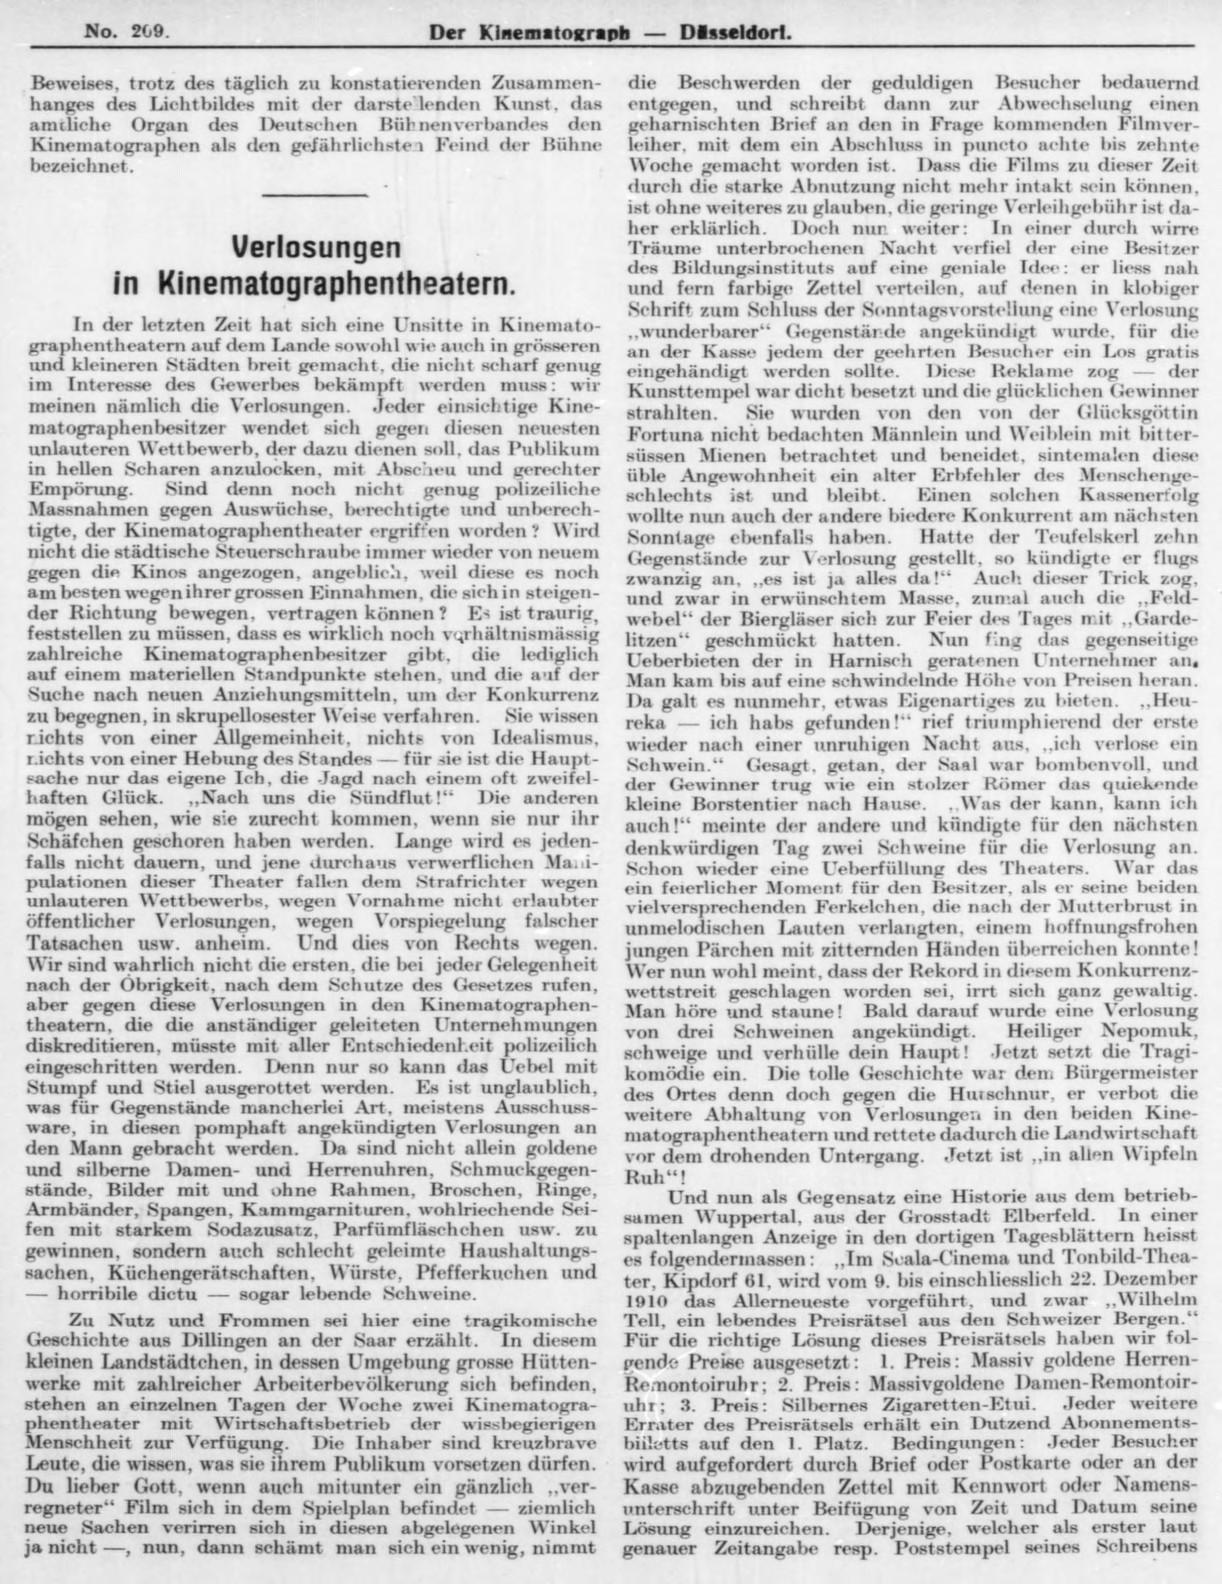 Kinematograph04-1910-12_jp2.zip&file=kinematograph04-1910-12_jp2%2fkinematograph04-1910-12_0093